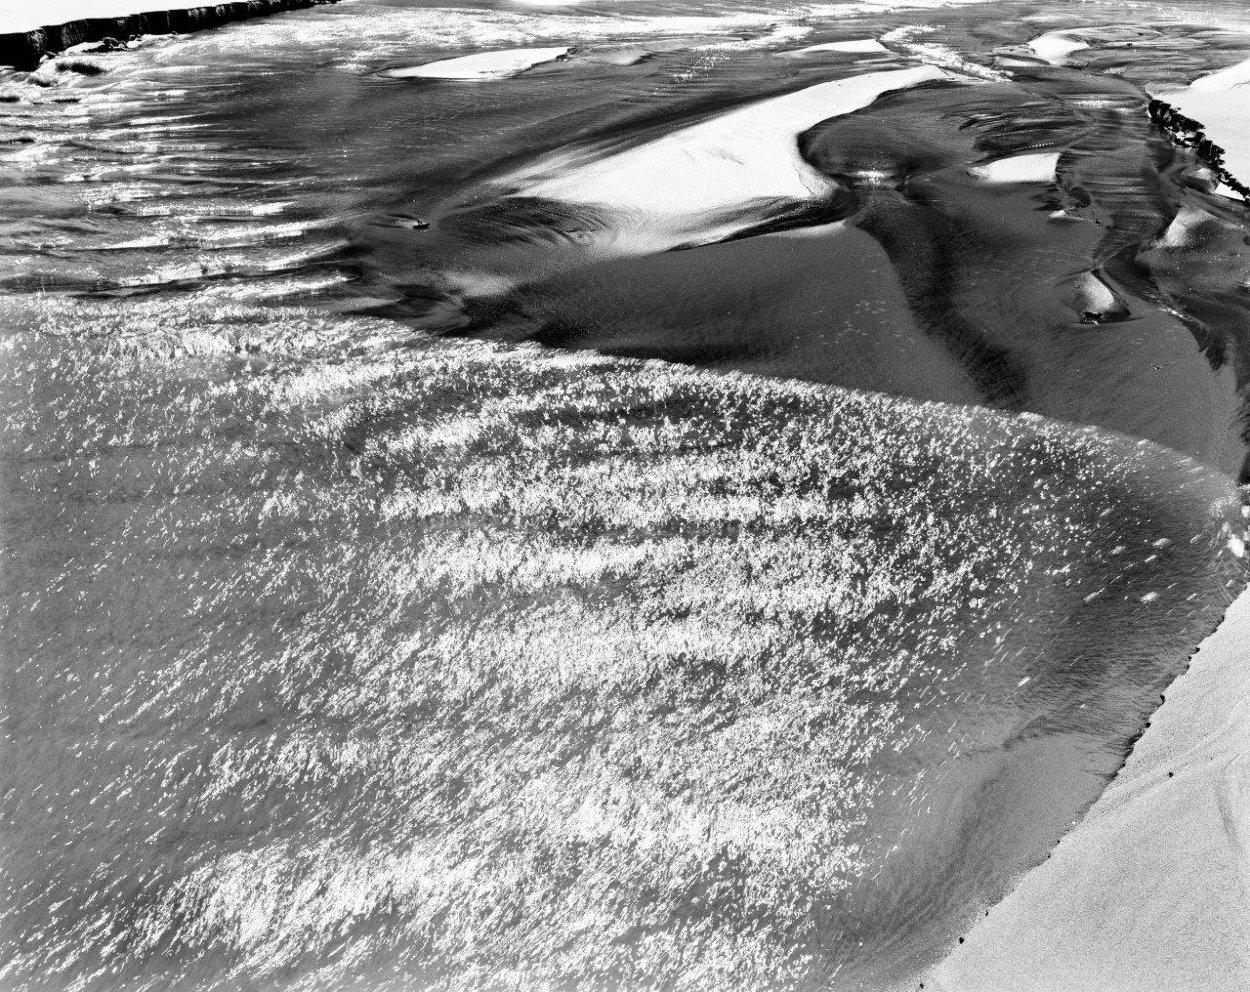 Pfeiffer Beach, California, USA 2014 Limited Edition Print by Simeon Posen